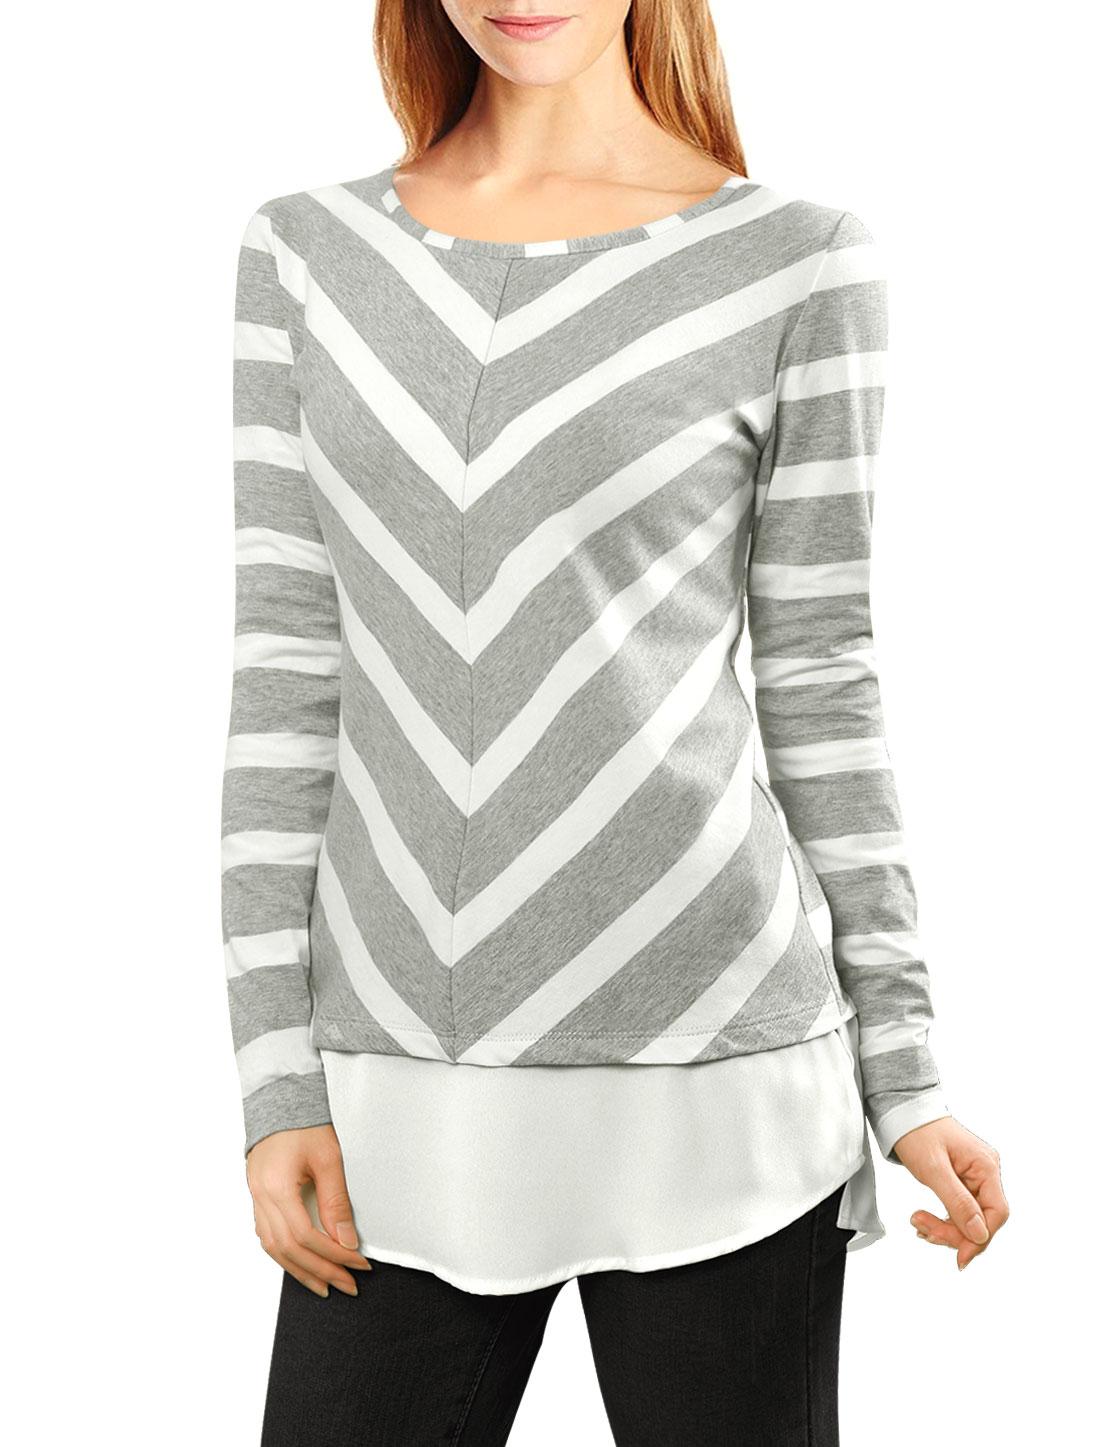 Women Layered Tunic Top in Striped and Chevron Print Gray L